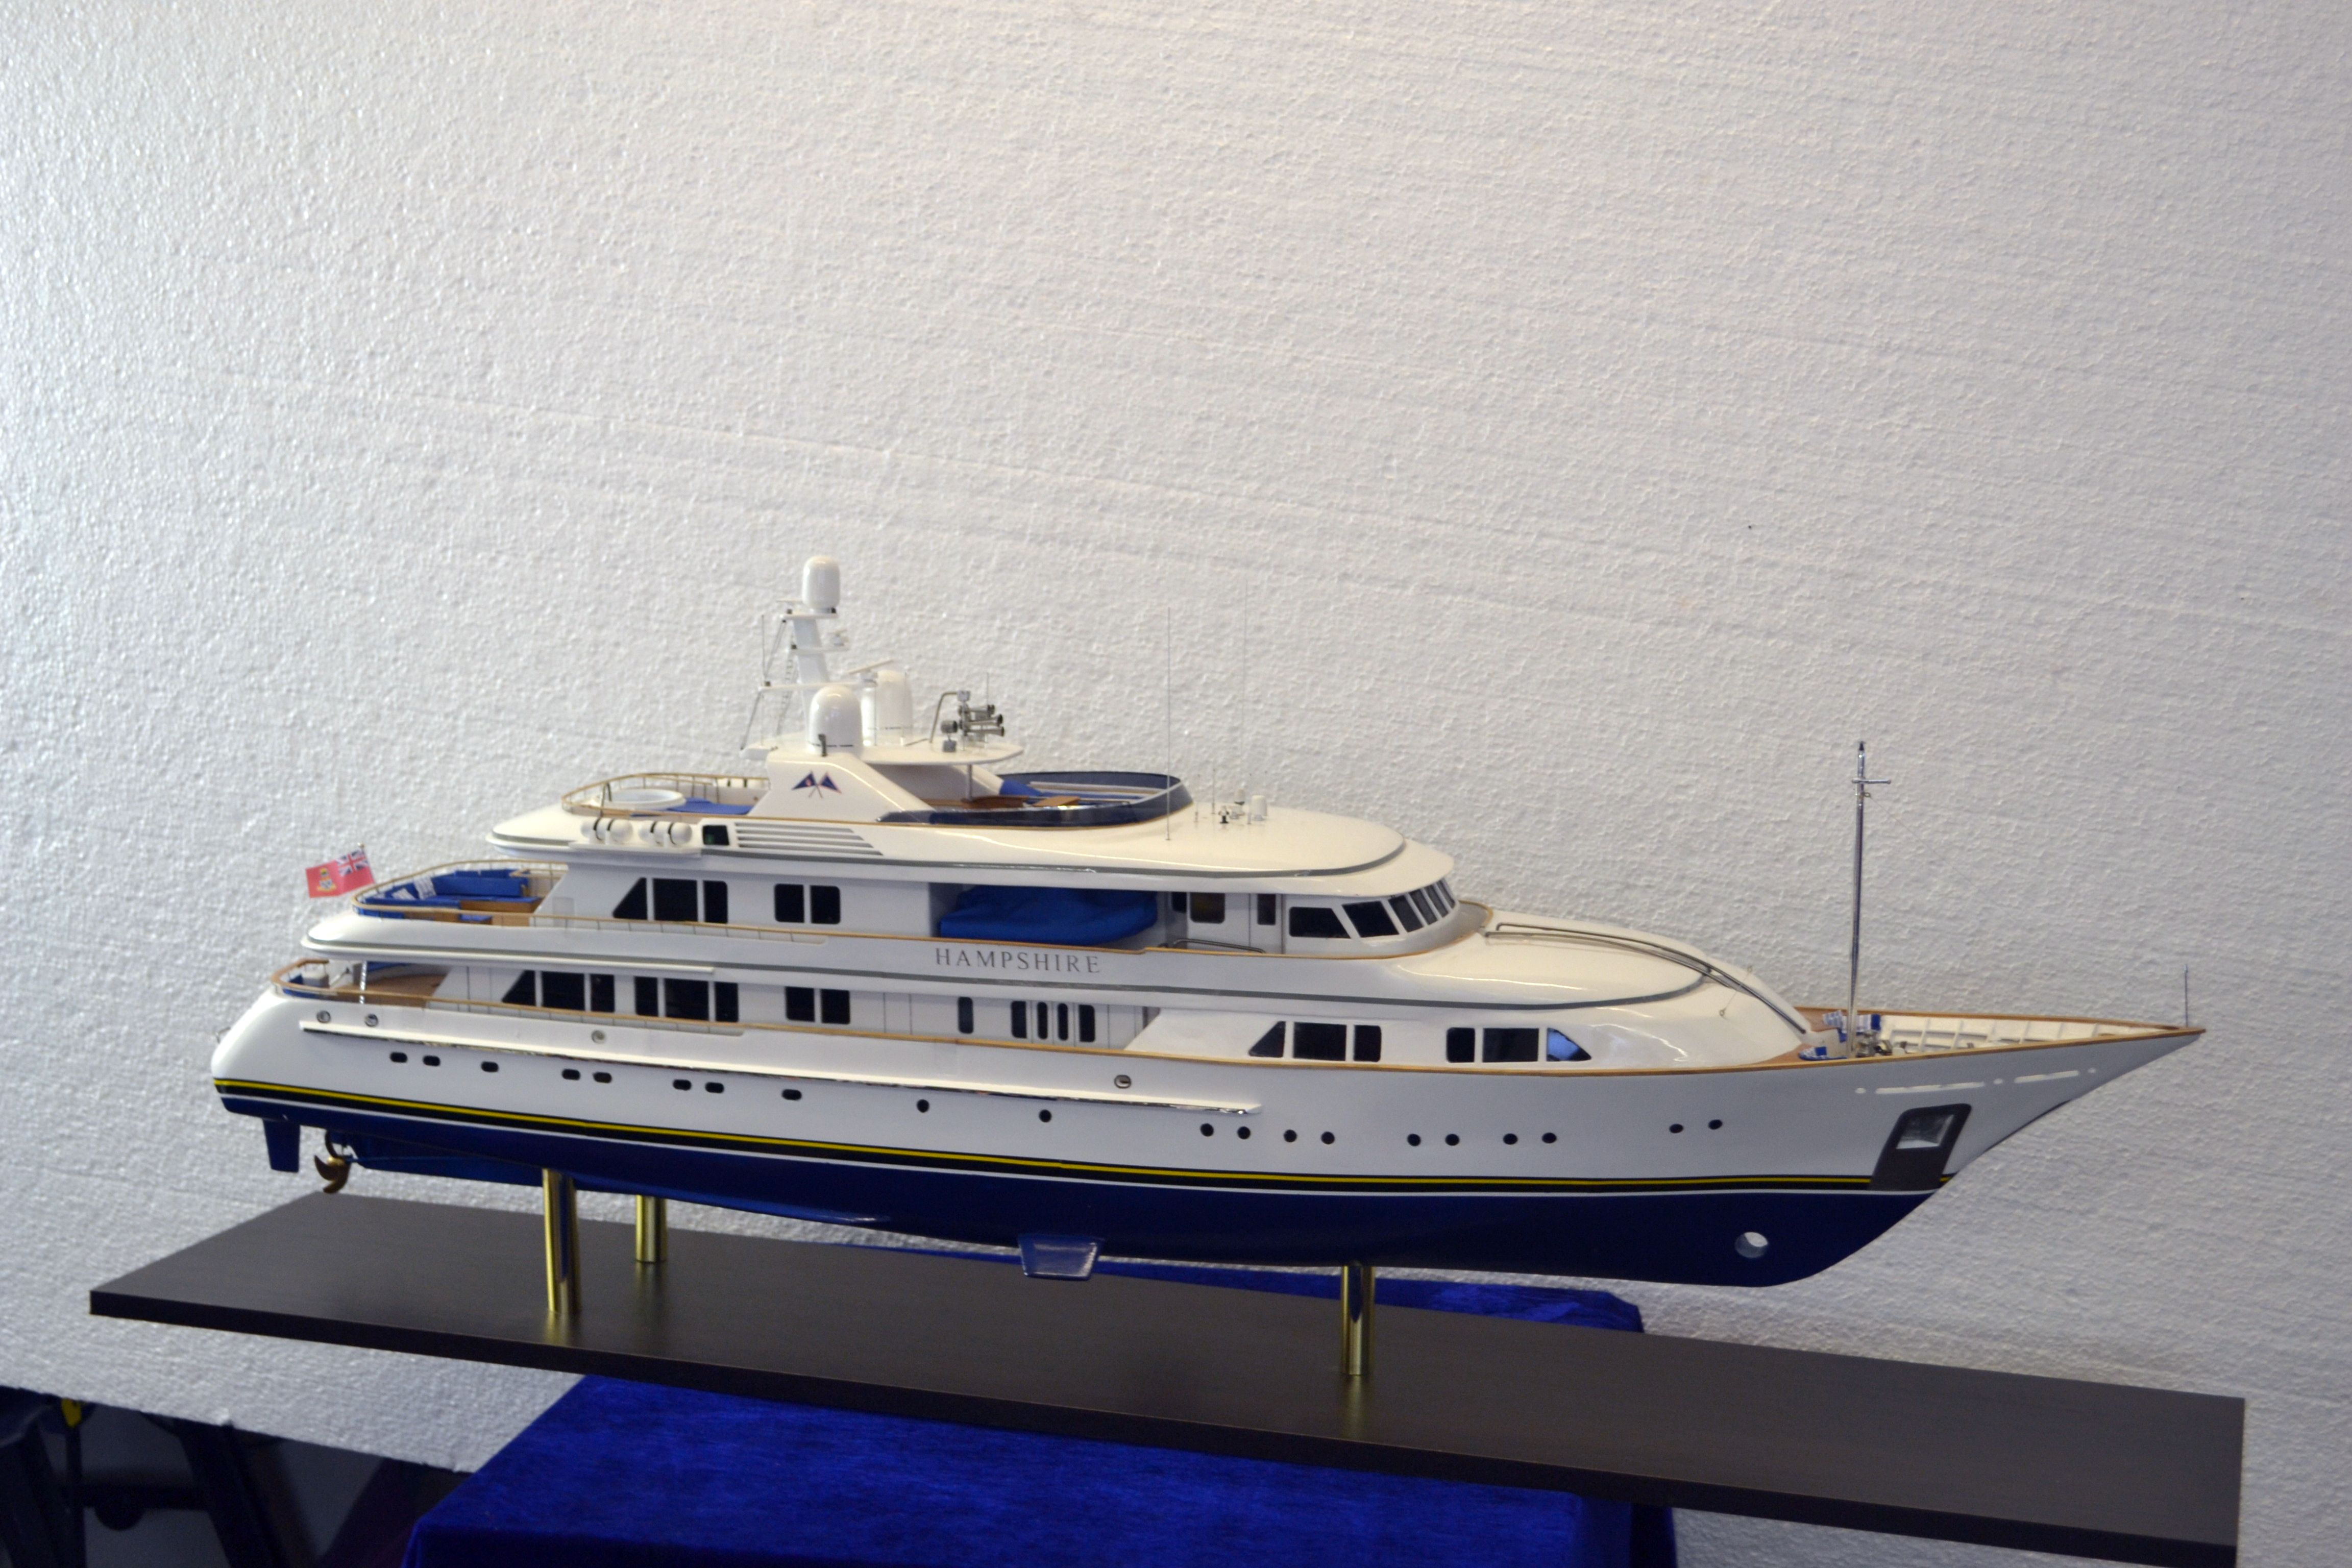 1492-6721-My-Hampshire-Custom-Built-Model-Yacht